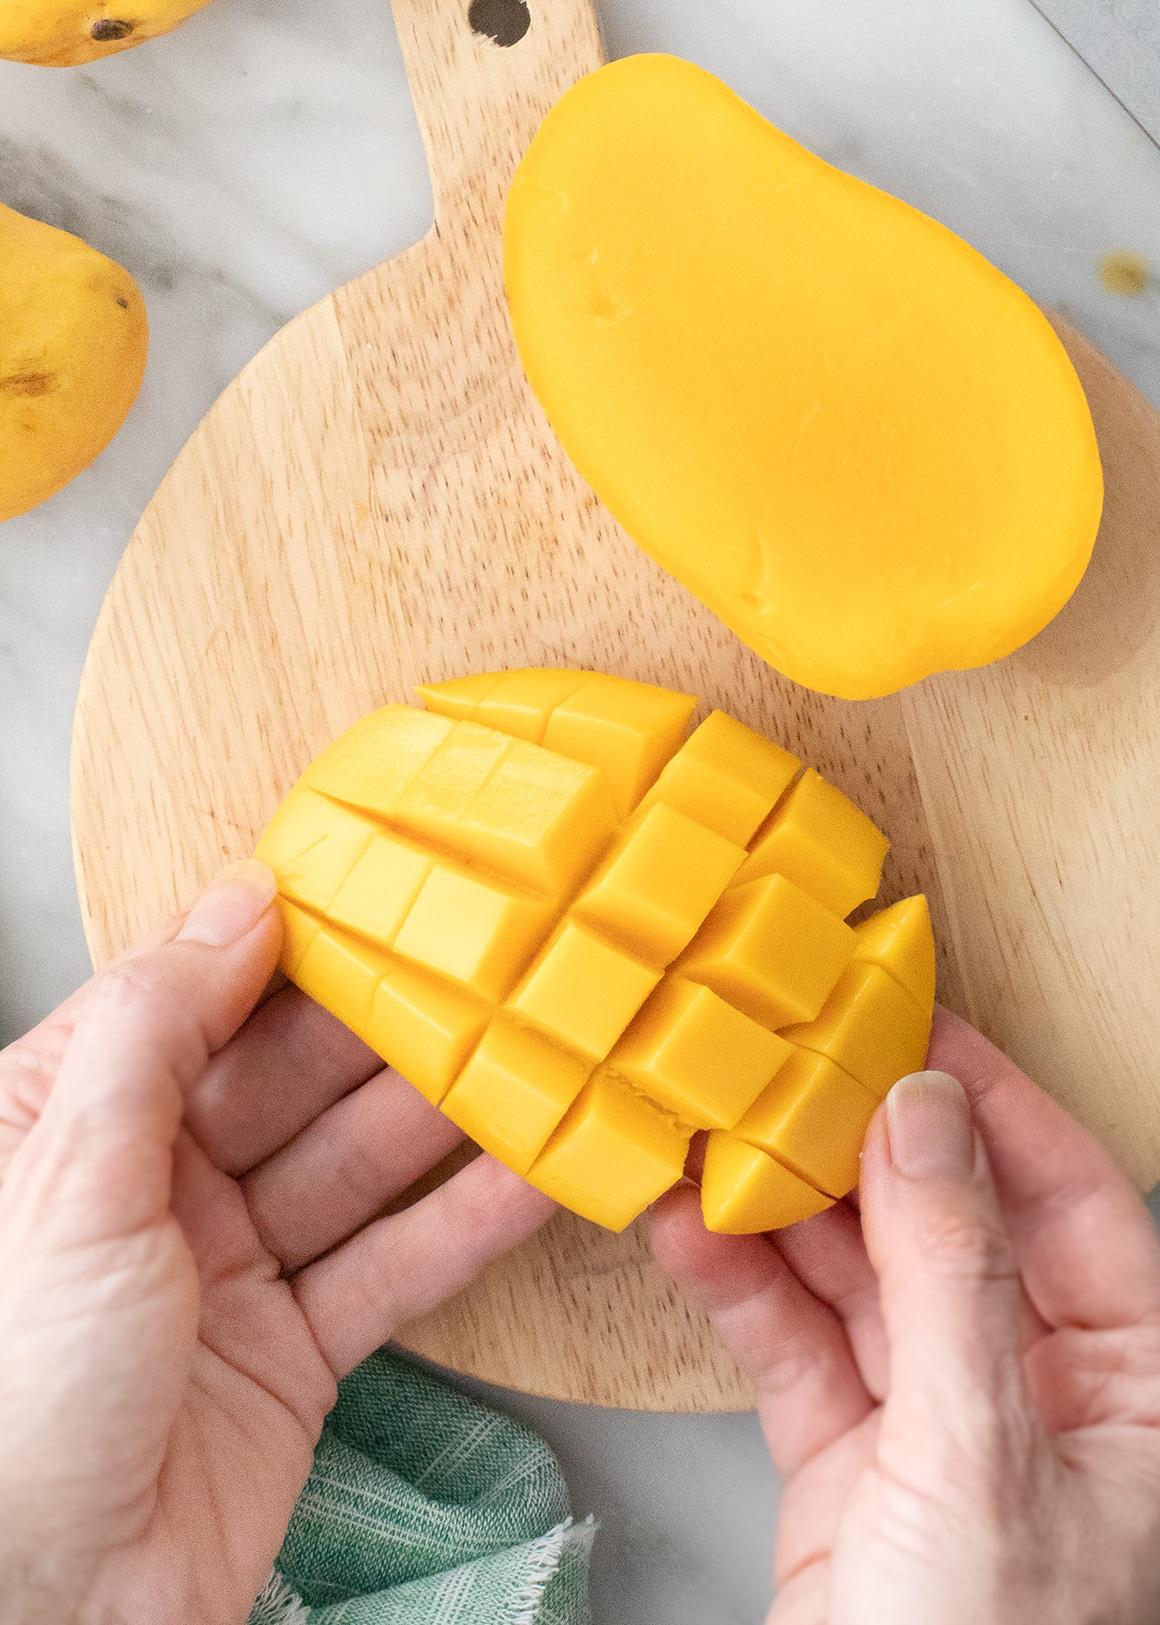 How to Cut a Mango - Love and Lemons